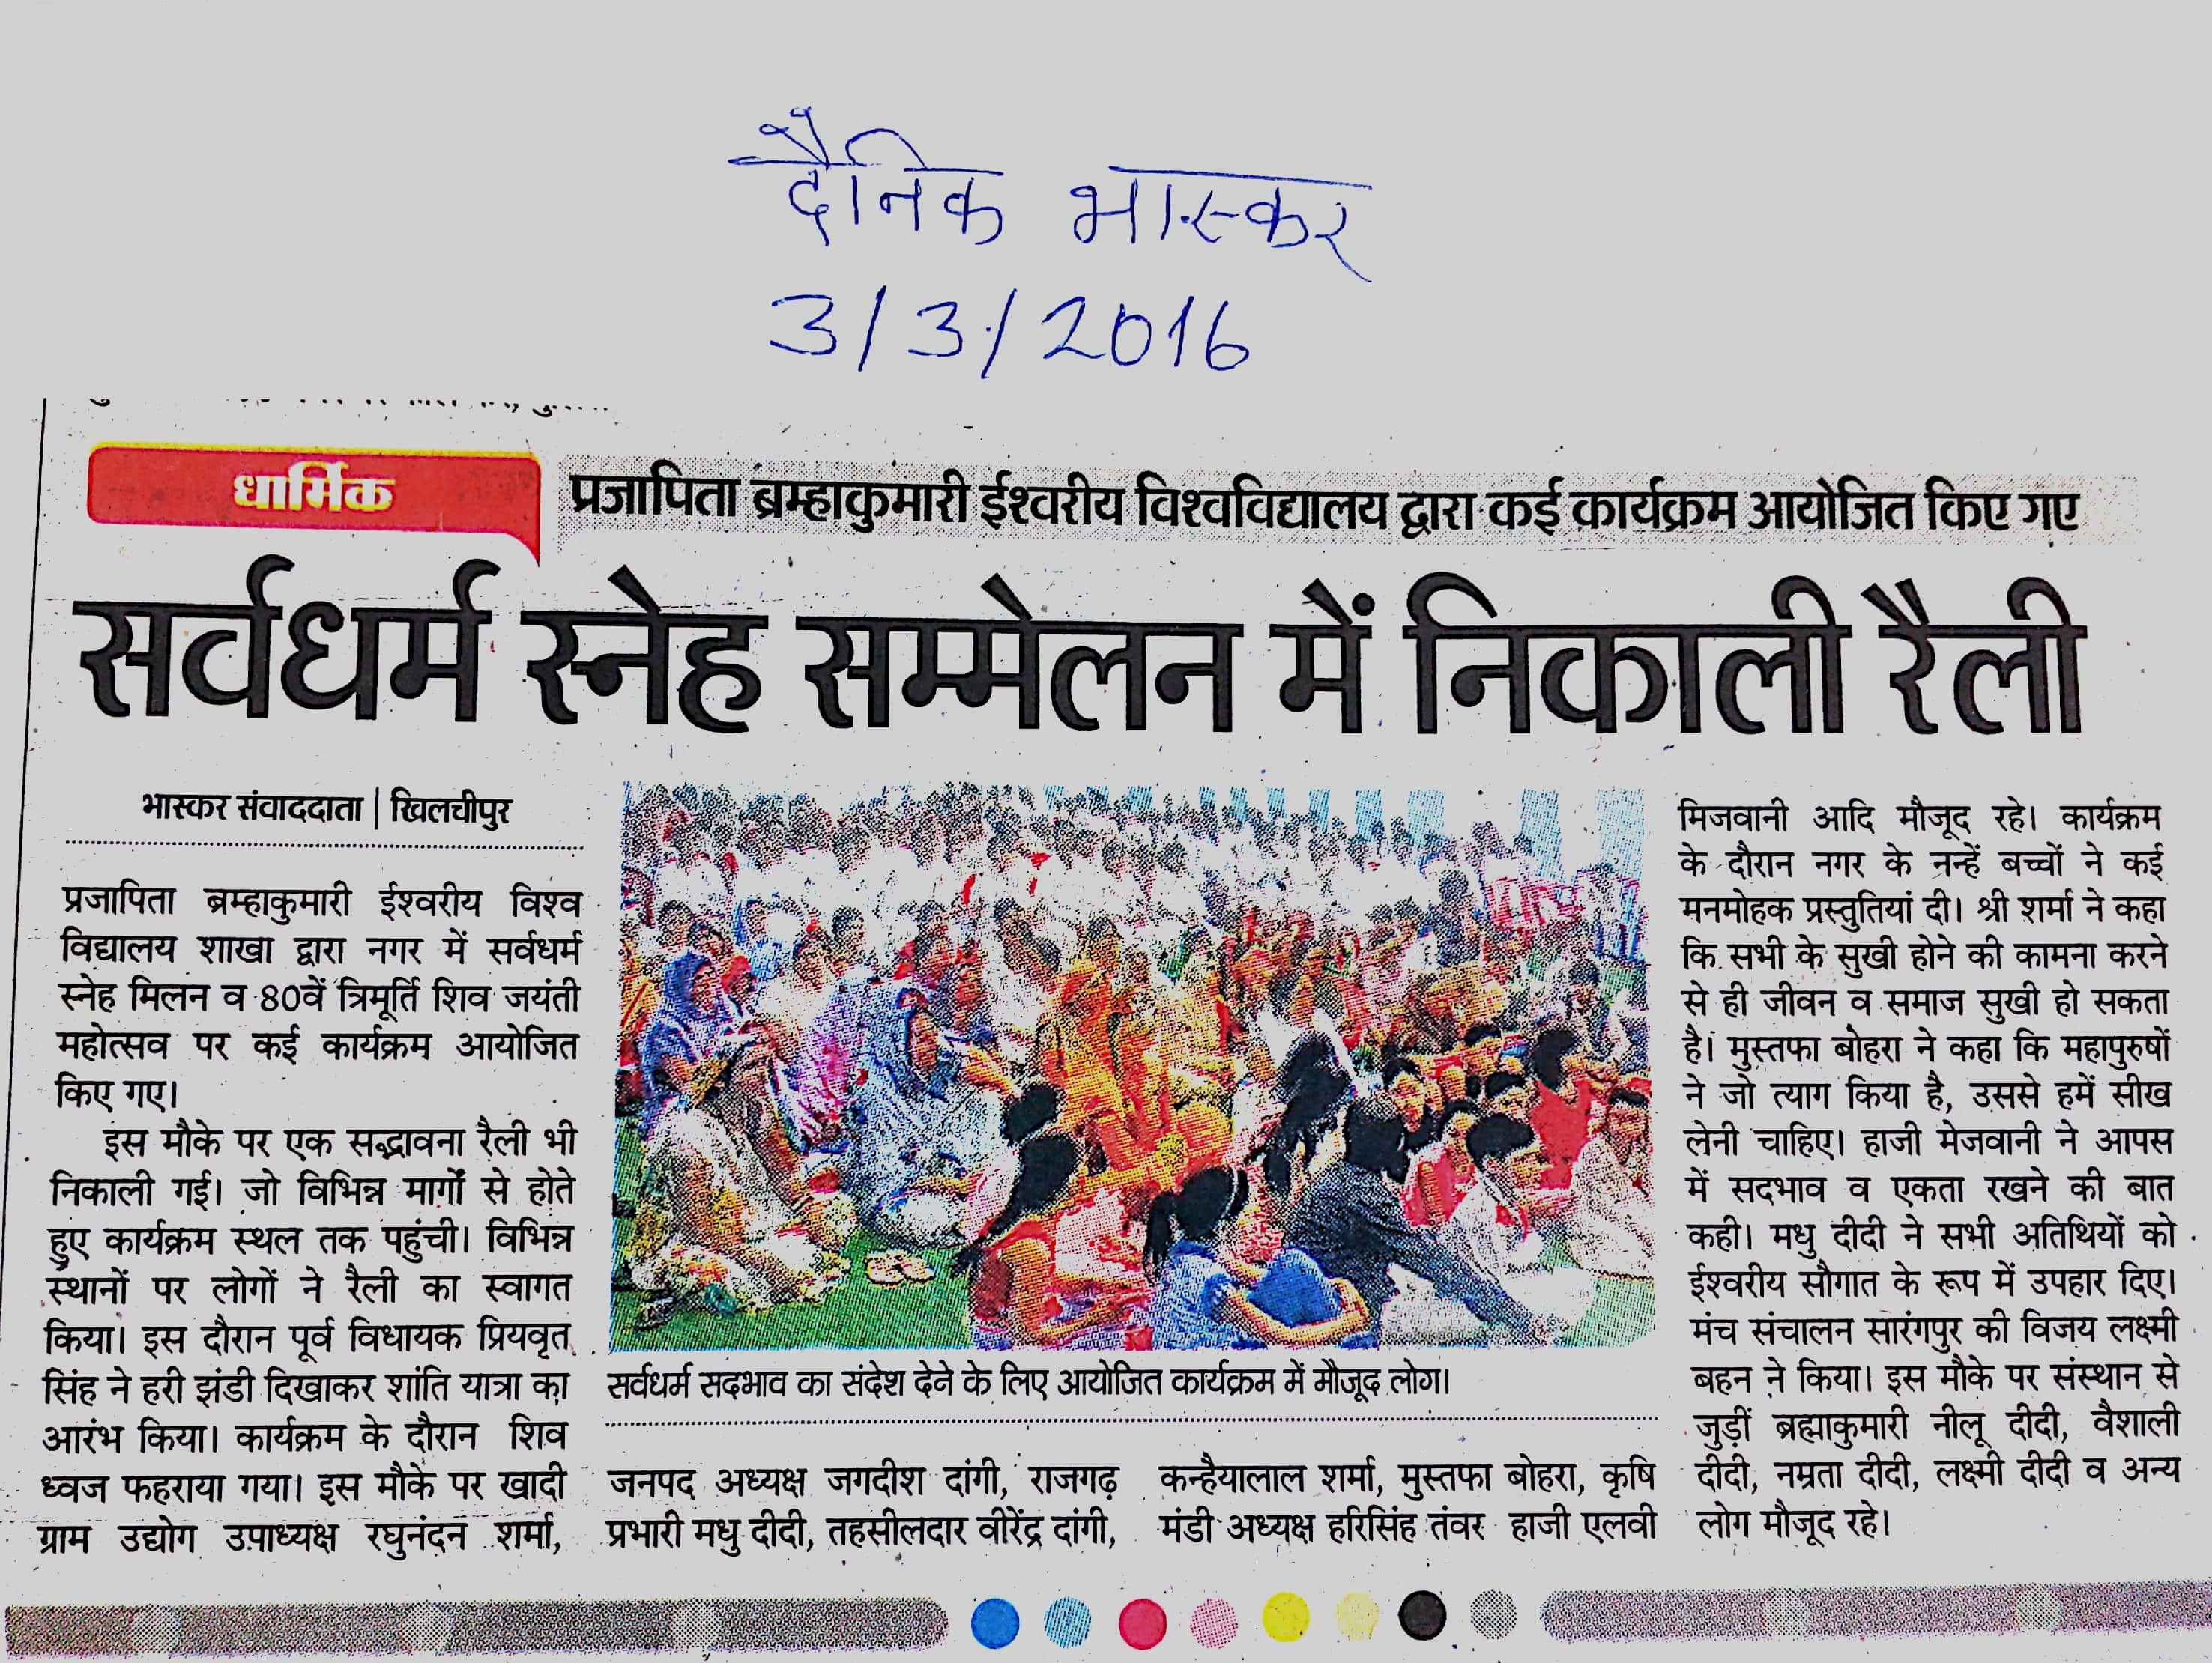 khilchipur 2016_8